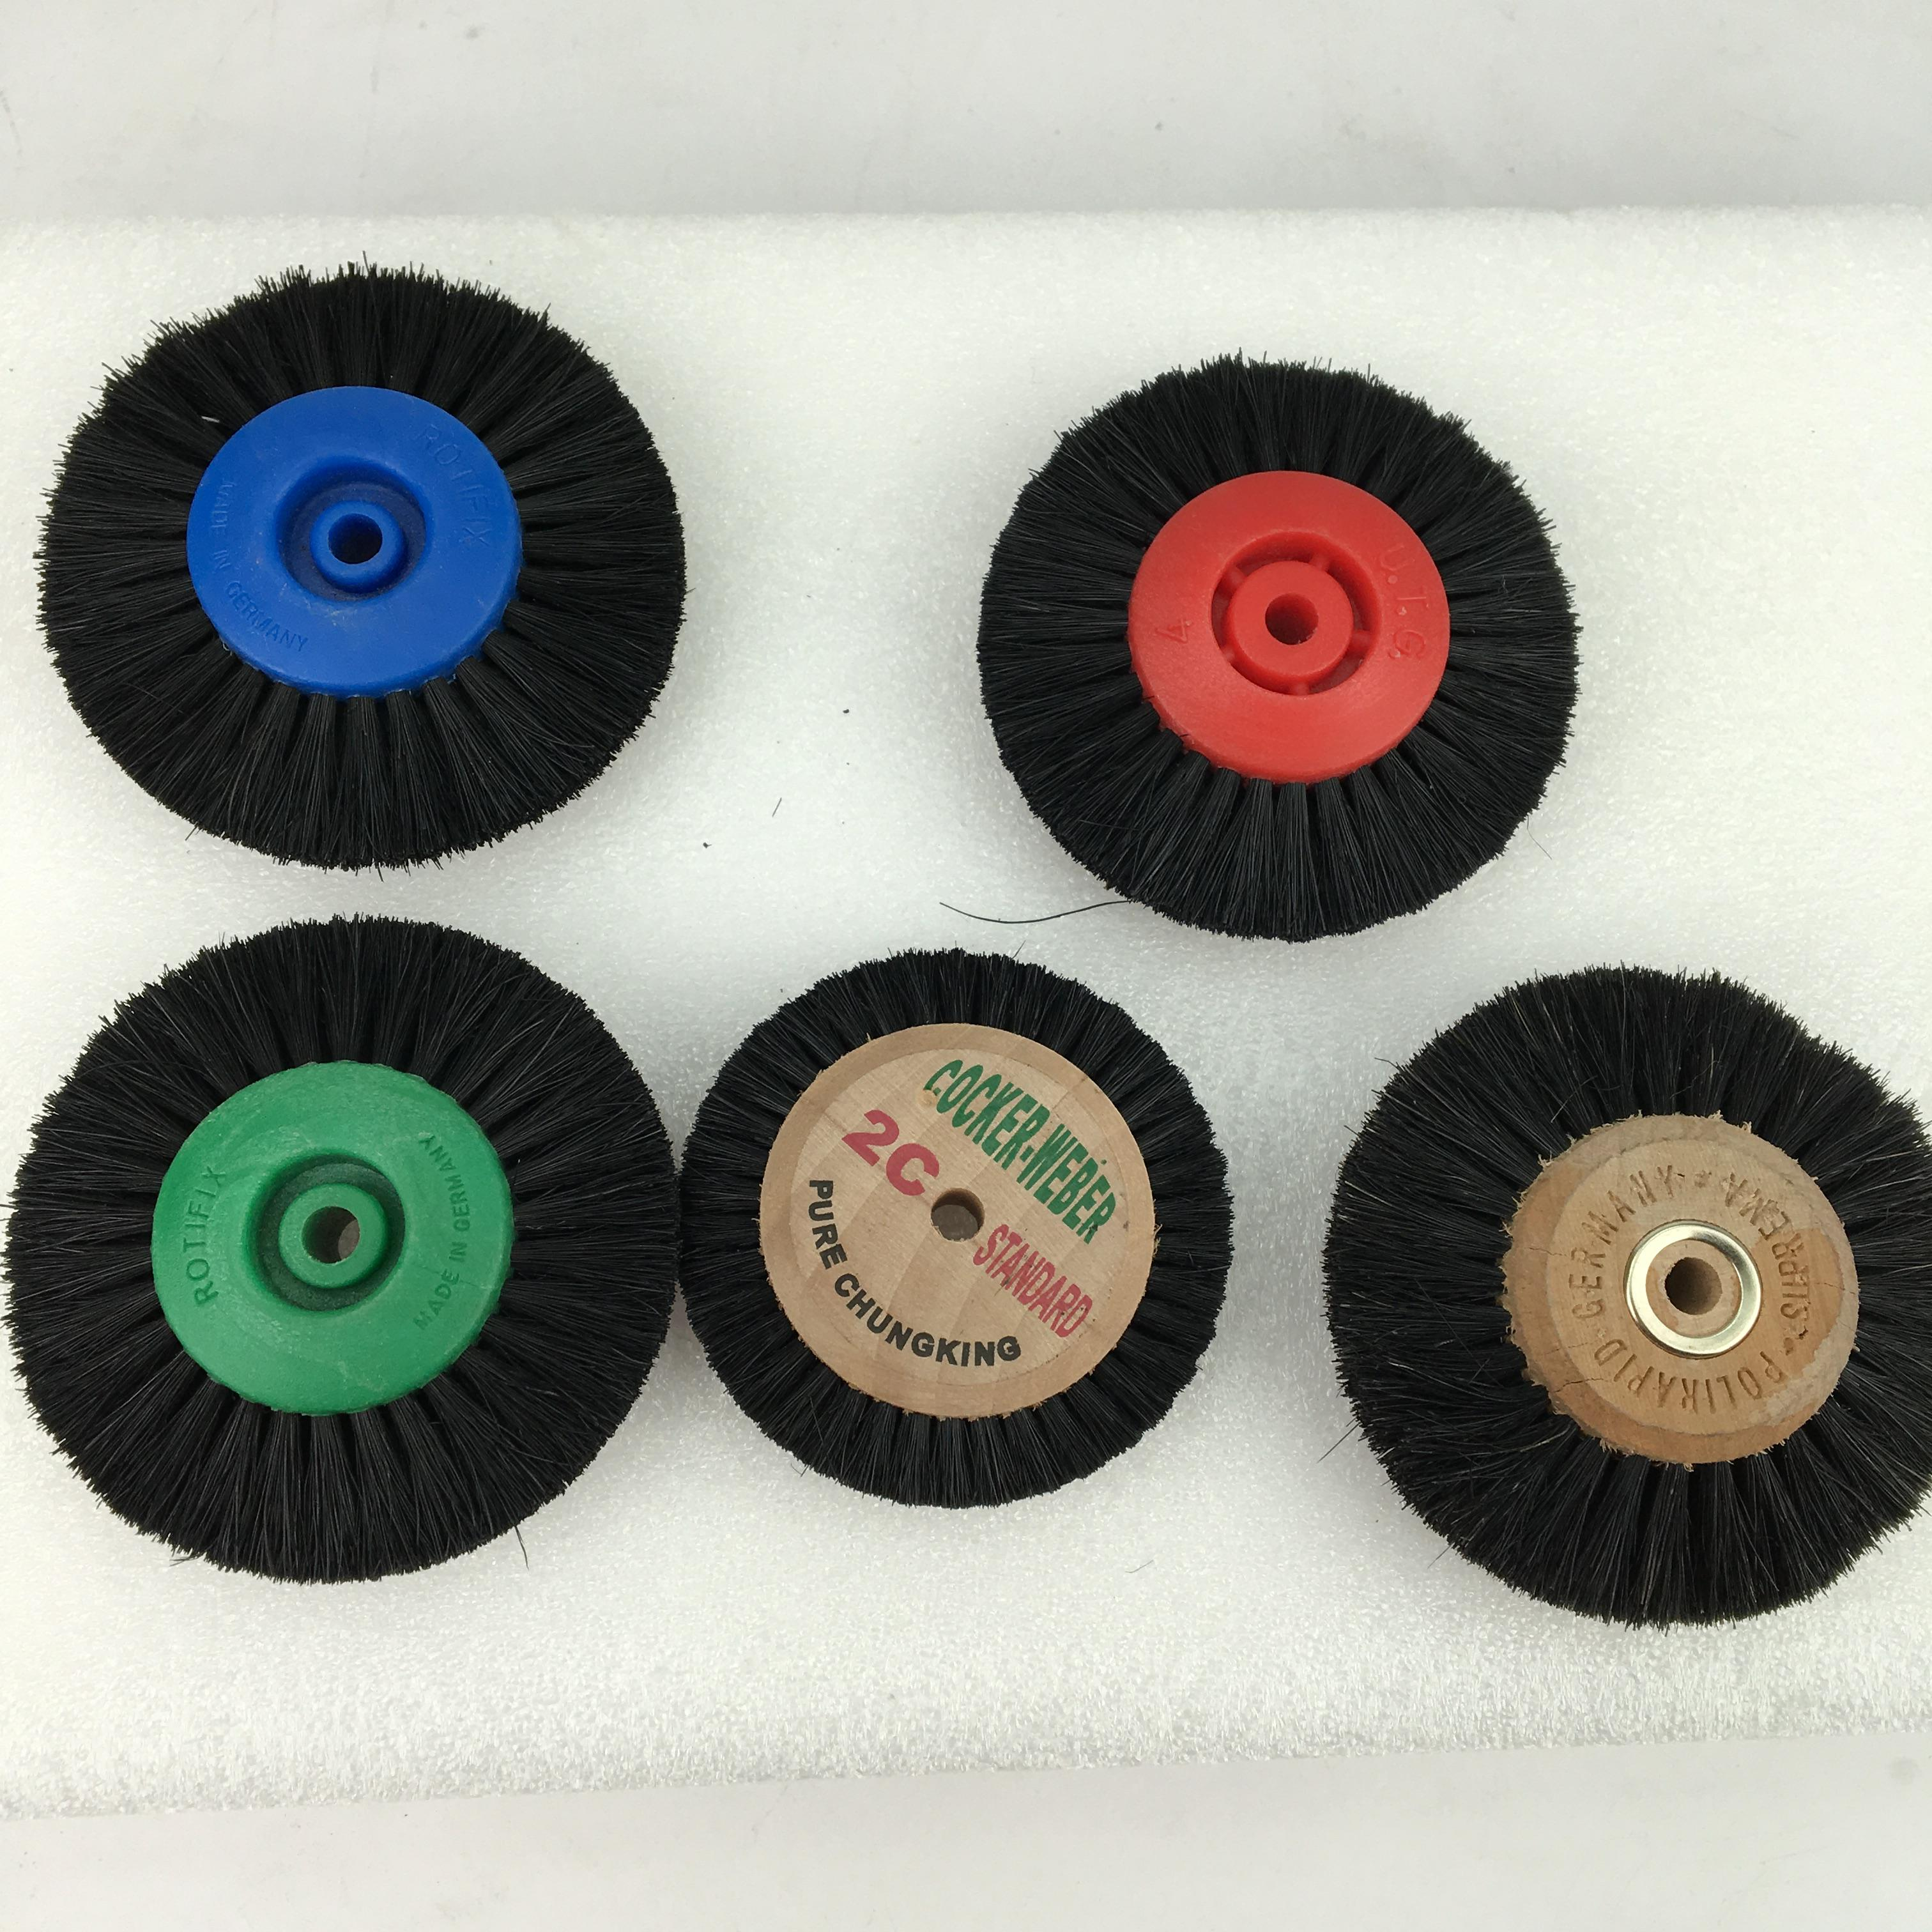 2C/4C  Wood Polishing Brush Polishing Wheel Buffing Wheel Dental Rotary Bristle For Dental Tooth Alloy Jewelry Polishing Cleanin